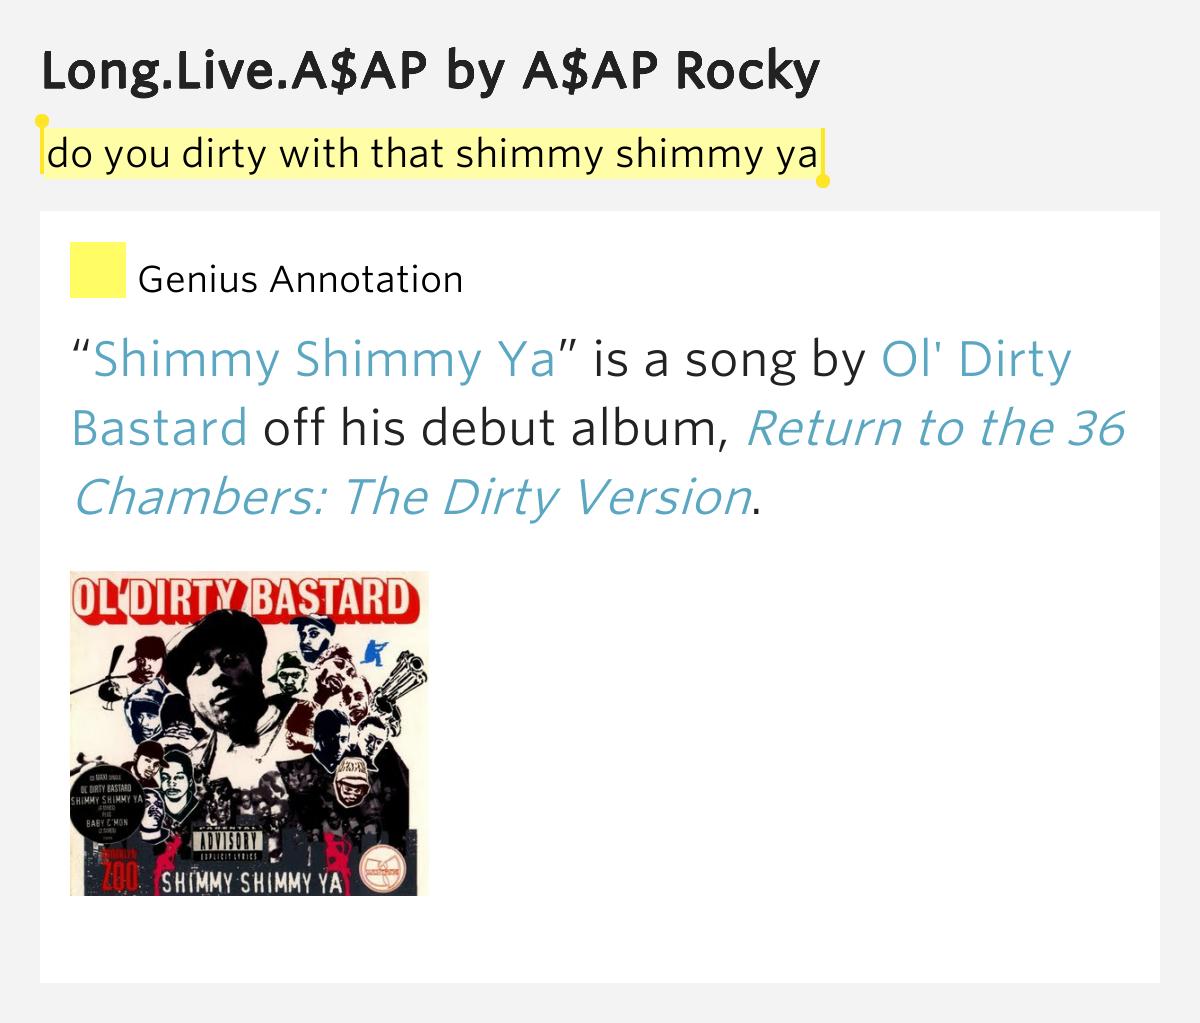 Lyrics containing the term: shimmy